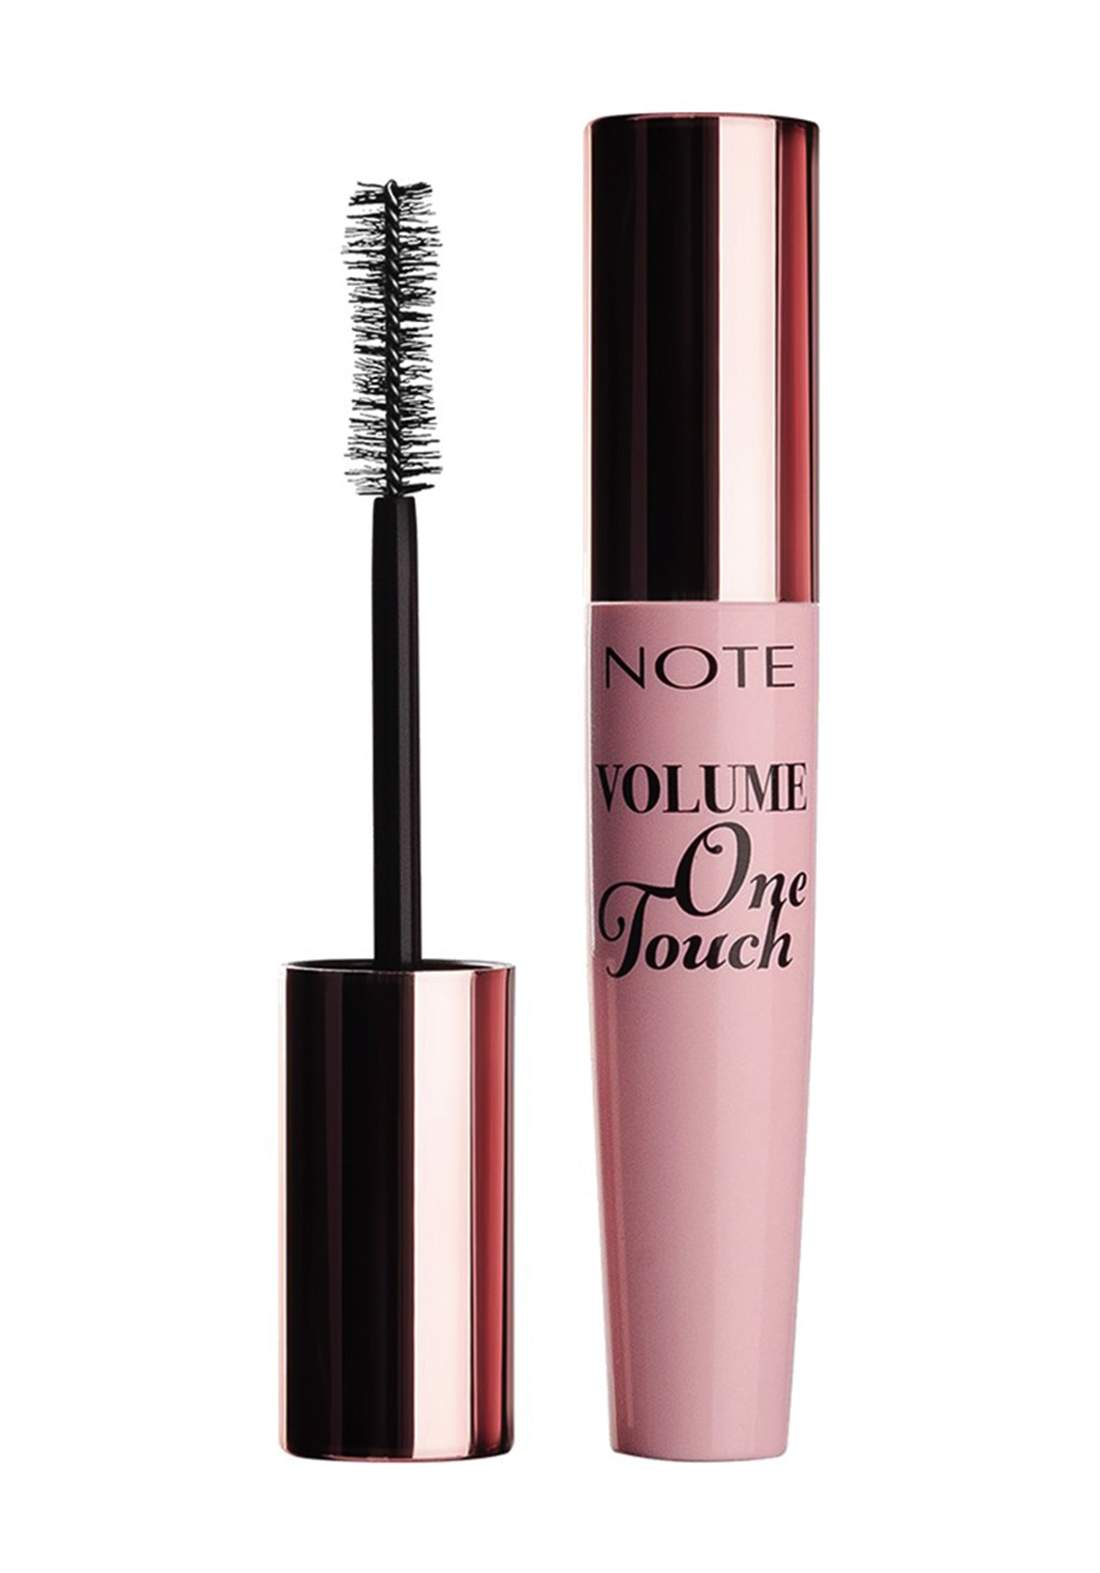 Note Volume One Touch Mascara 10 ml  No.01  مسكارا